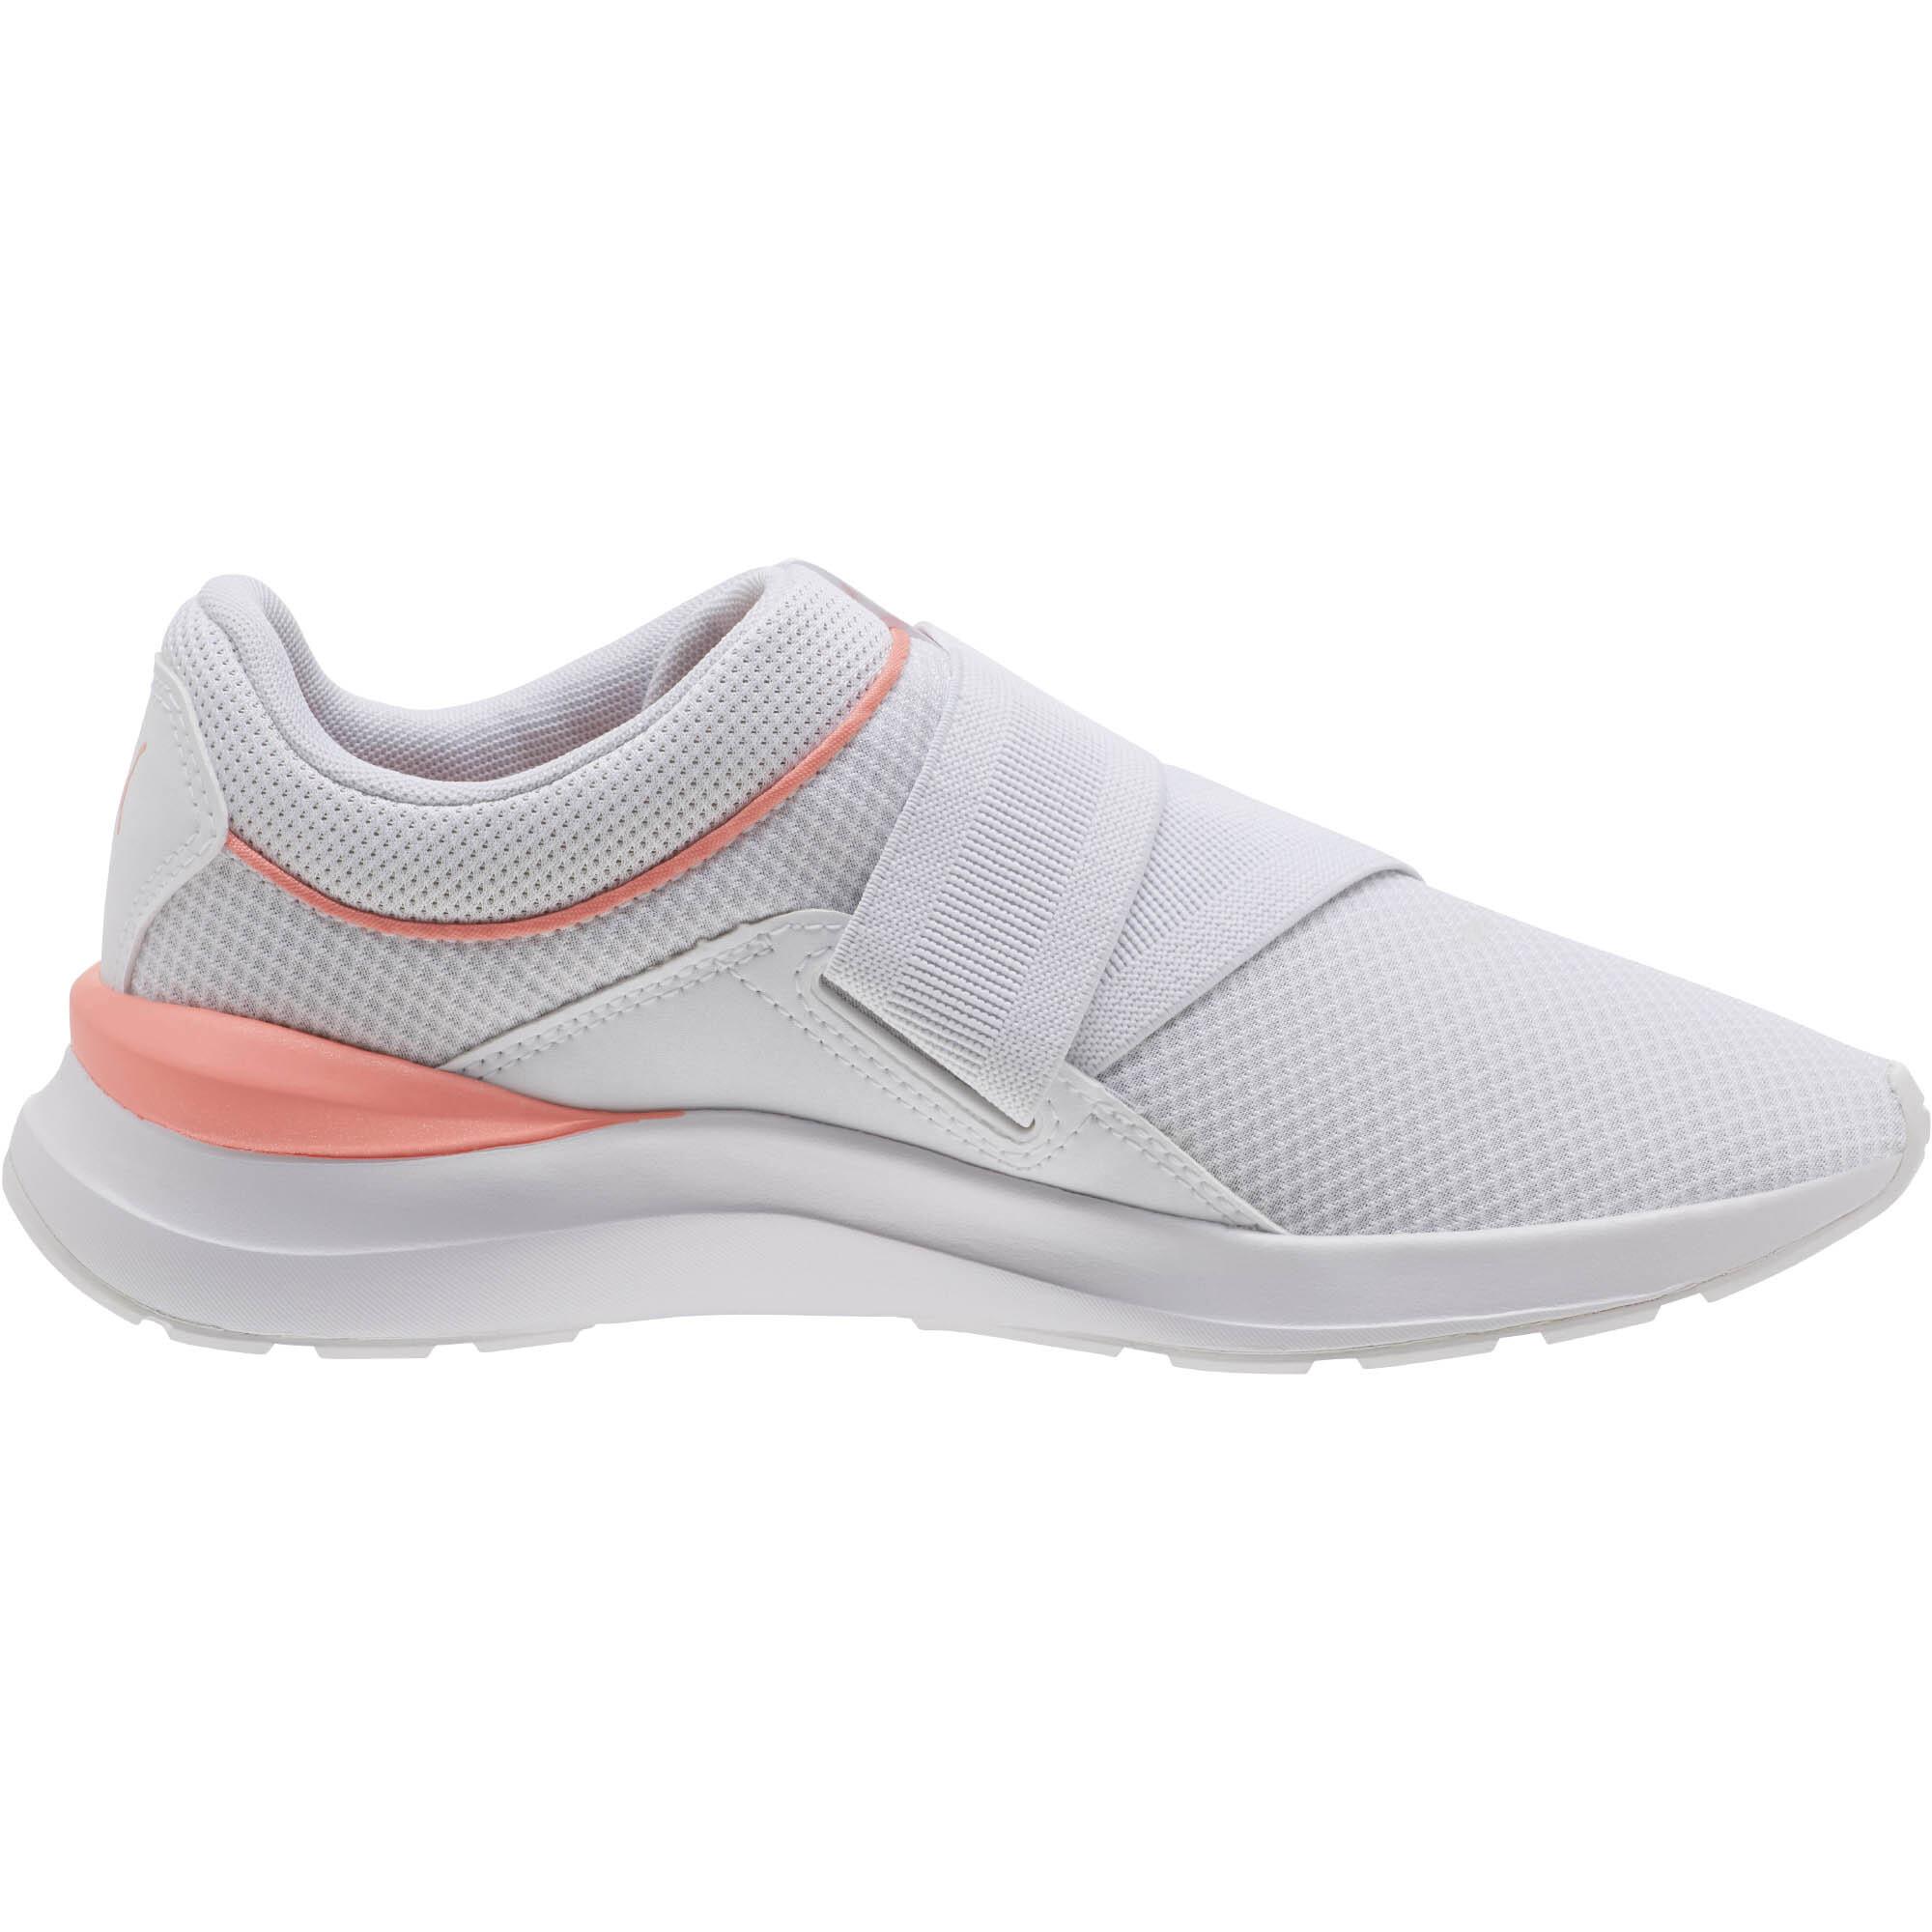 PUMA-Adela-X-Women-s-Sneakers-Women-Shoe-Basics thumbnail 17